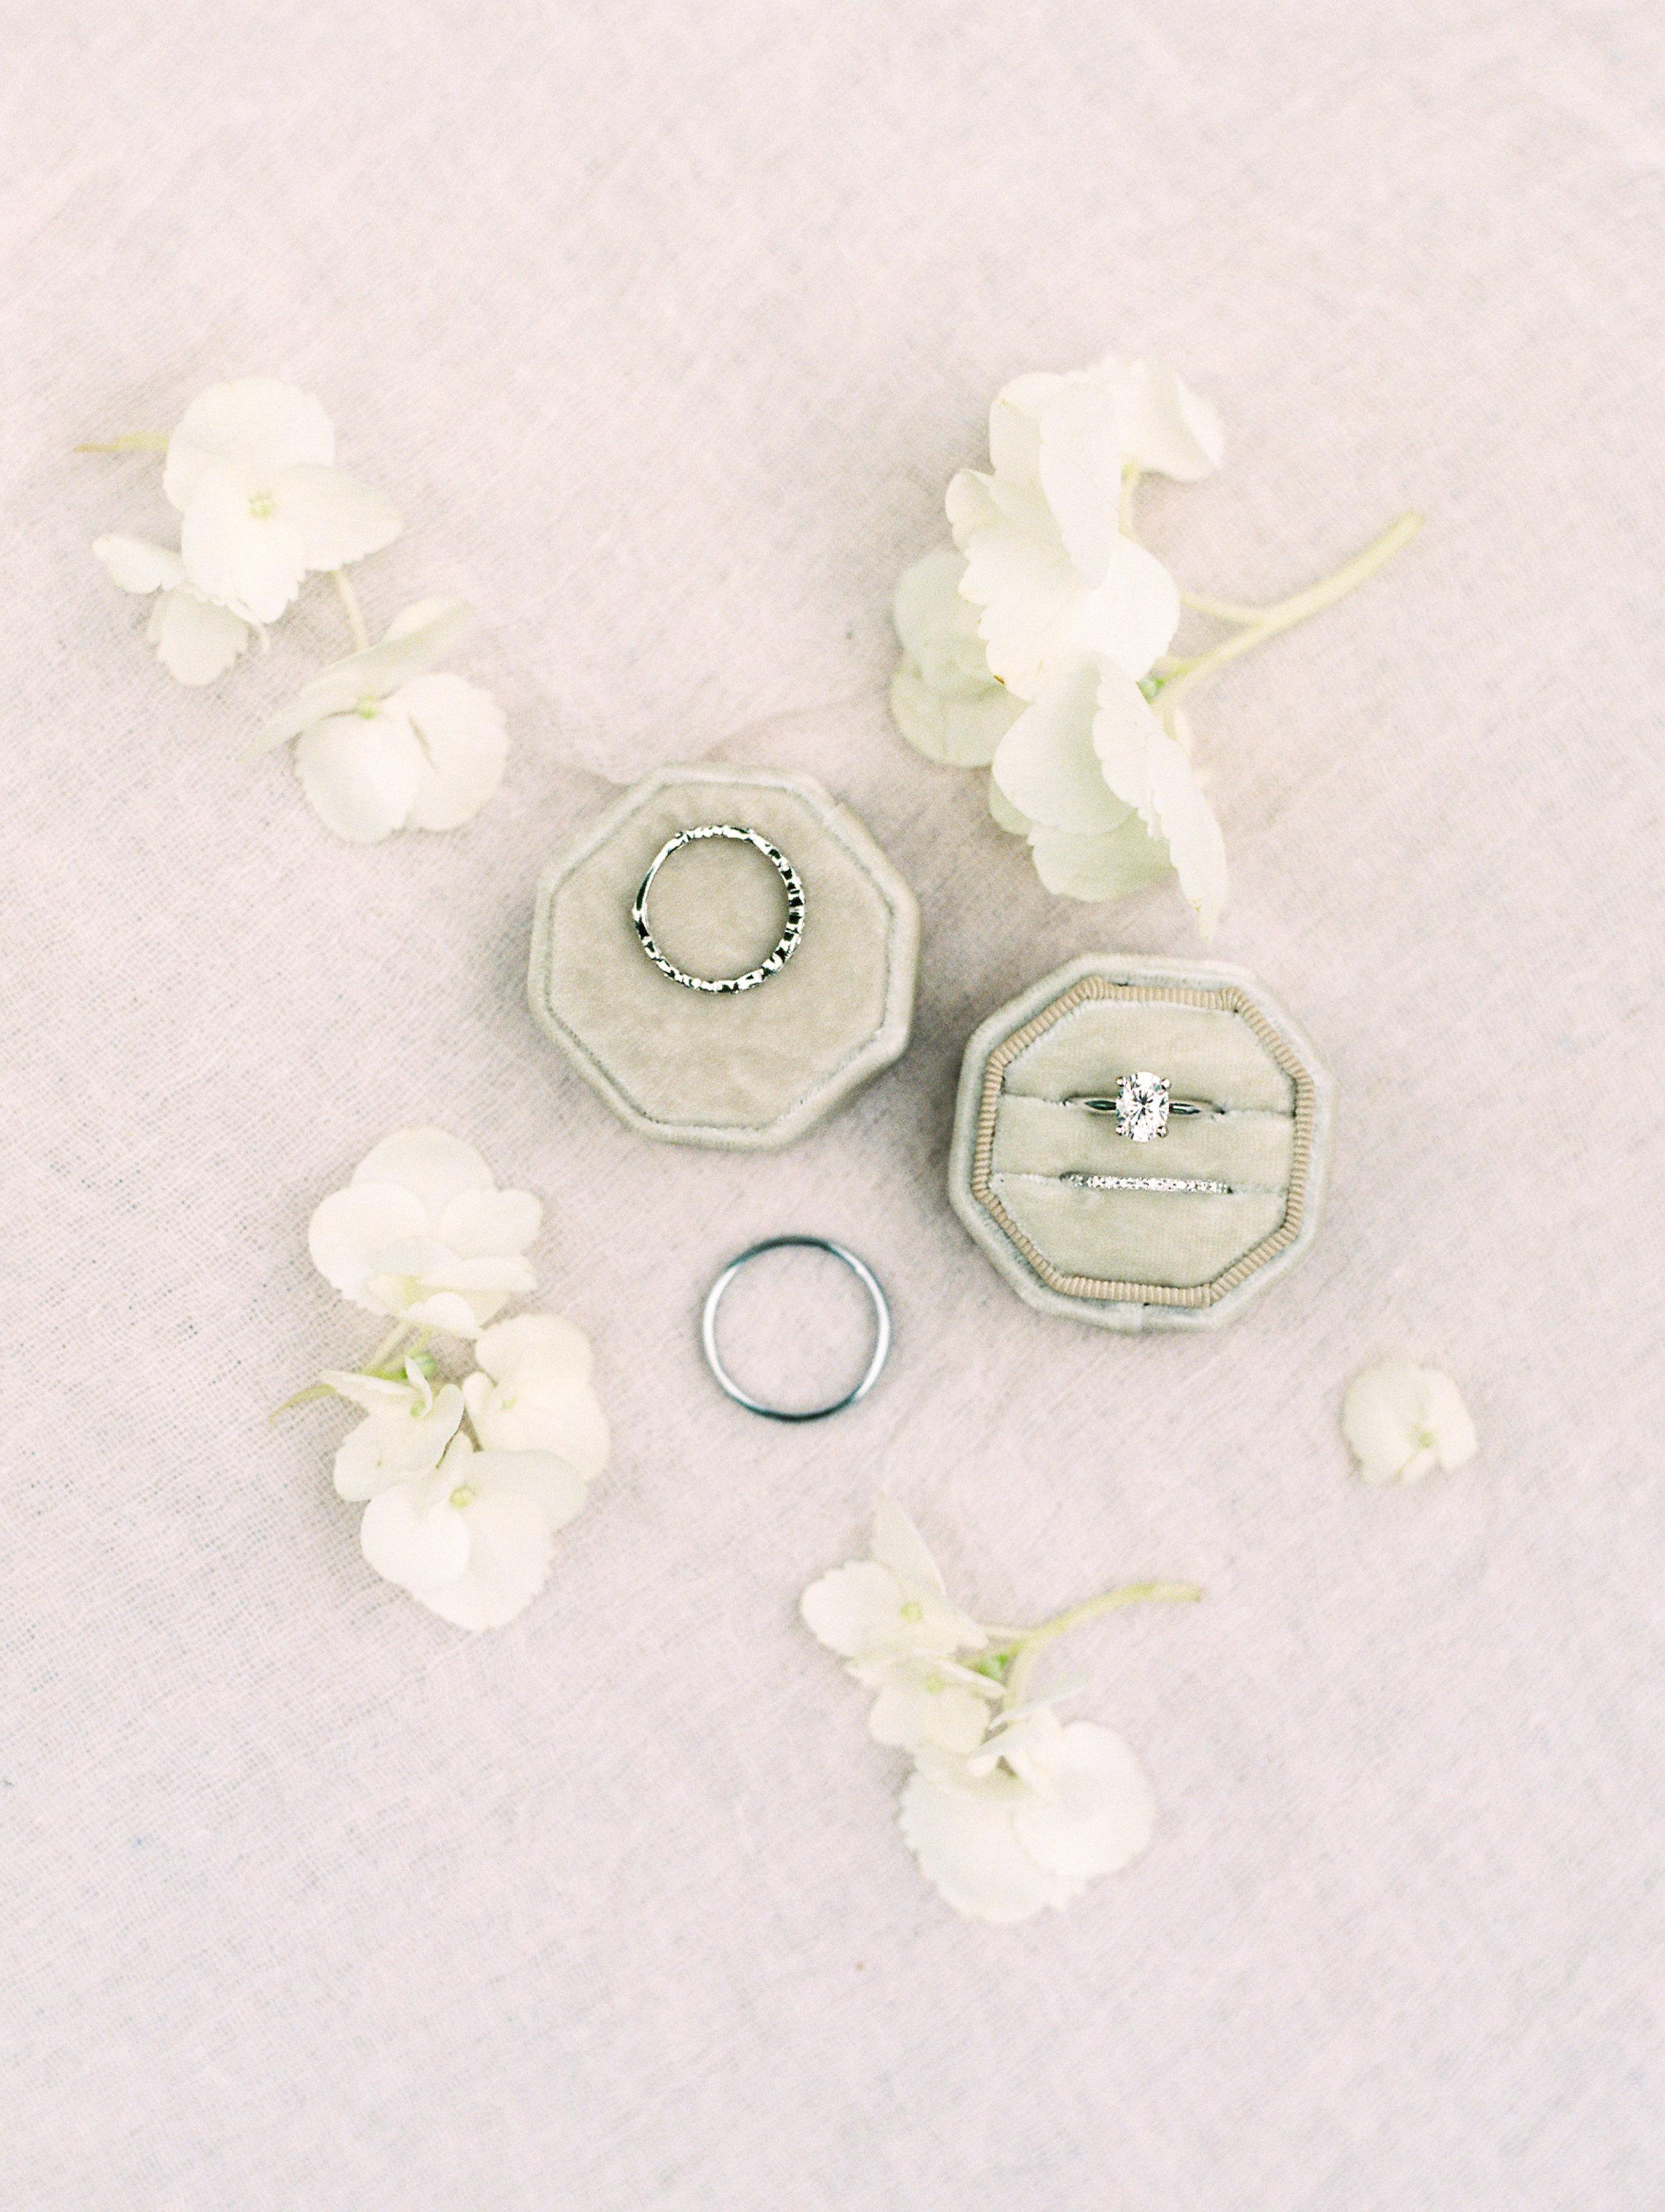 Conger+Wedding+Details-11.jpg